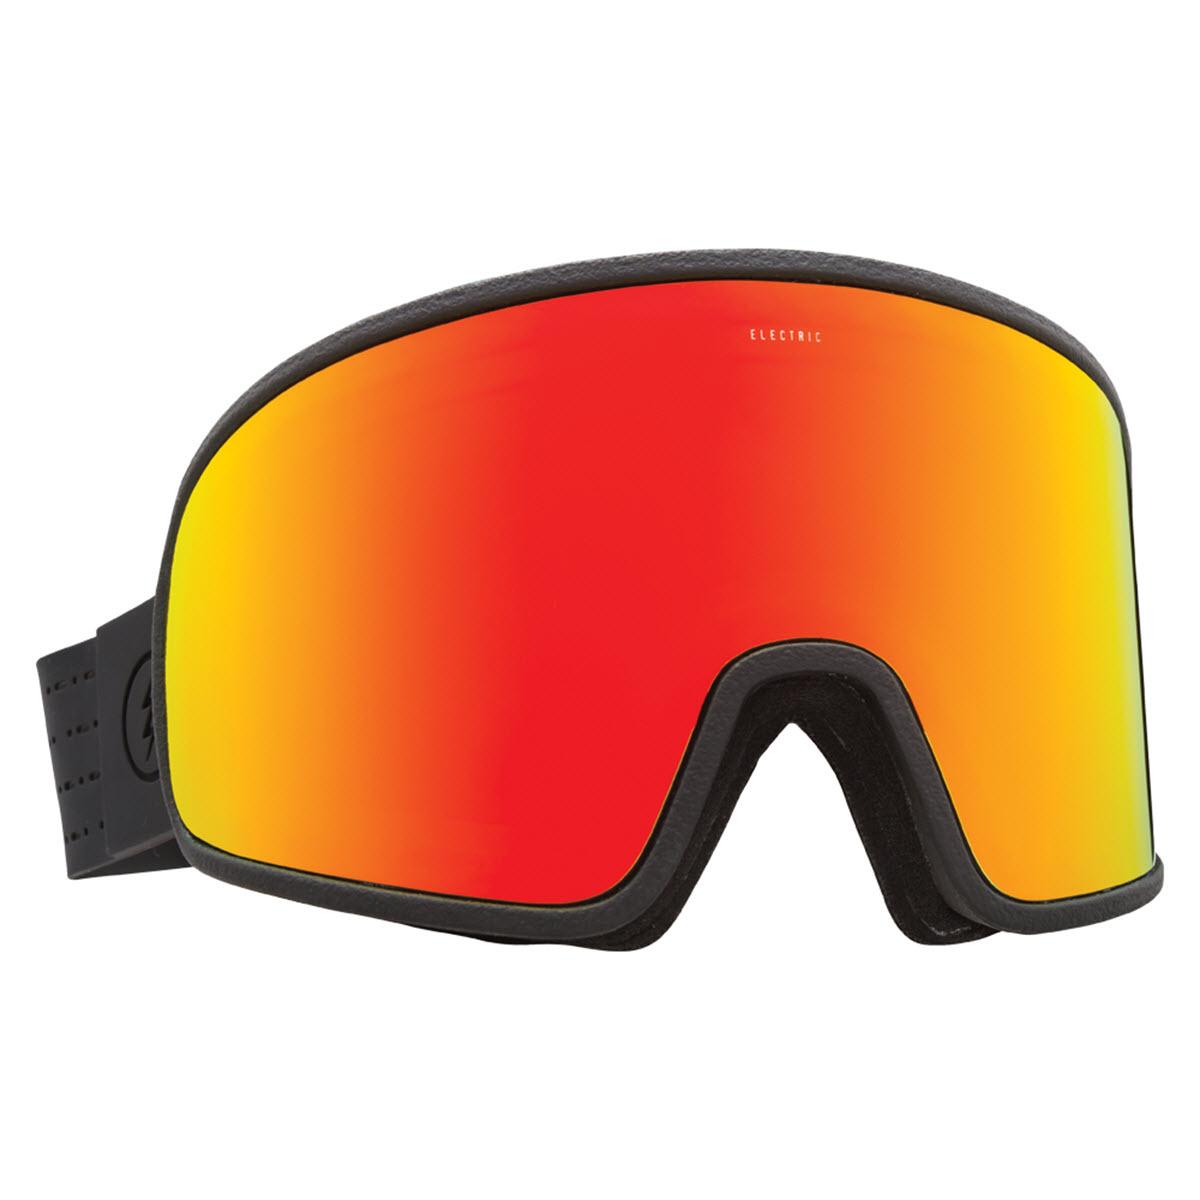 bdad8673454 Electric Electrolite Snowboard Goggles 2017 Matte Black Brose Red Chrome